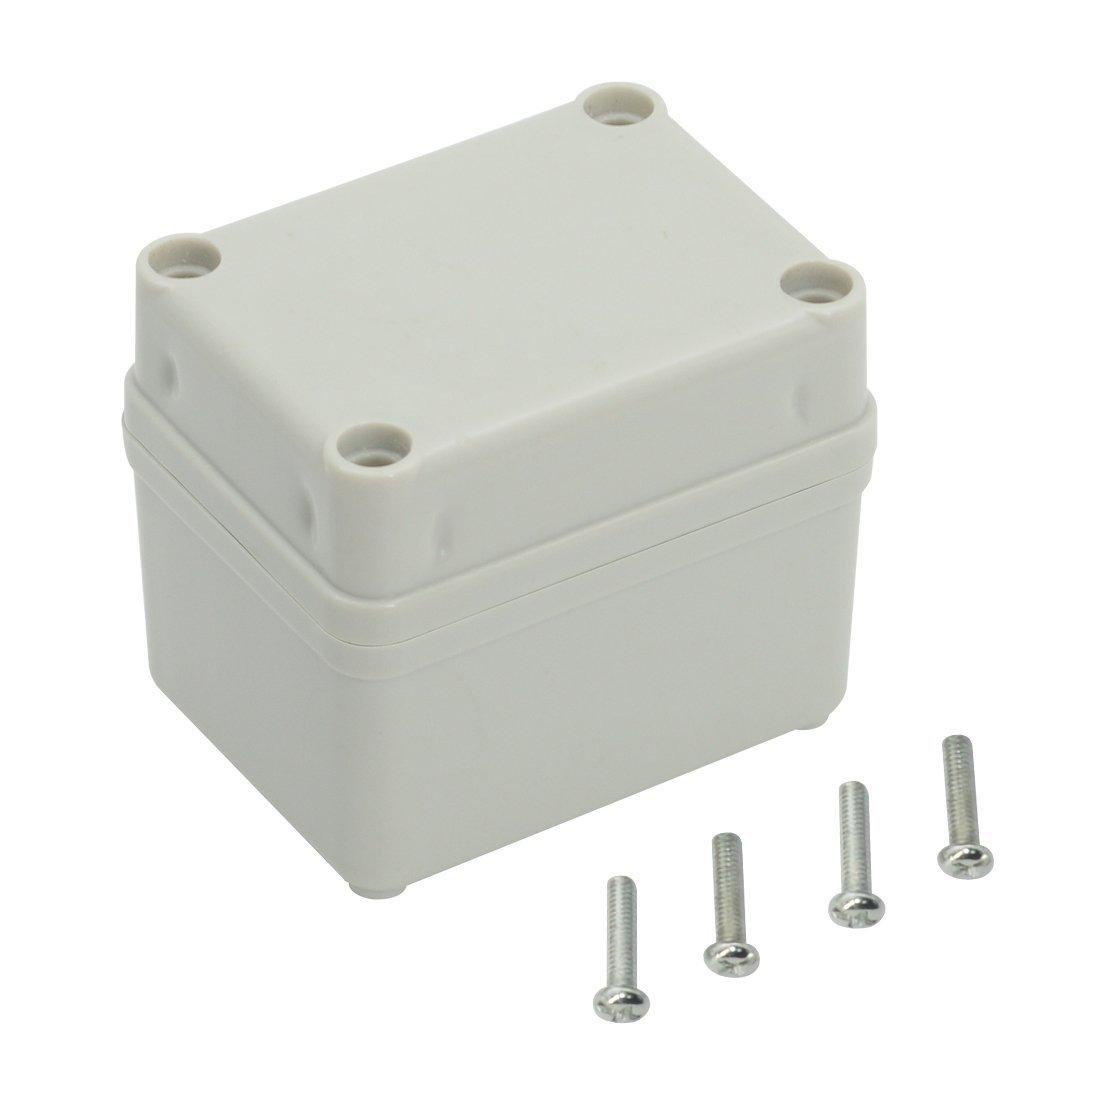 LeMotech Waterproof Dustproof IP67 Junction Box DIY Case Enclosure Gray 9.8' x 3.1' x 2.8'(250mm x 80mm x 70mm)